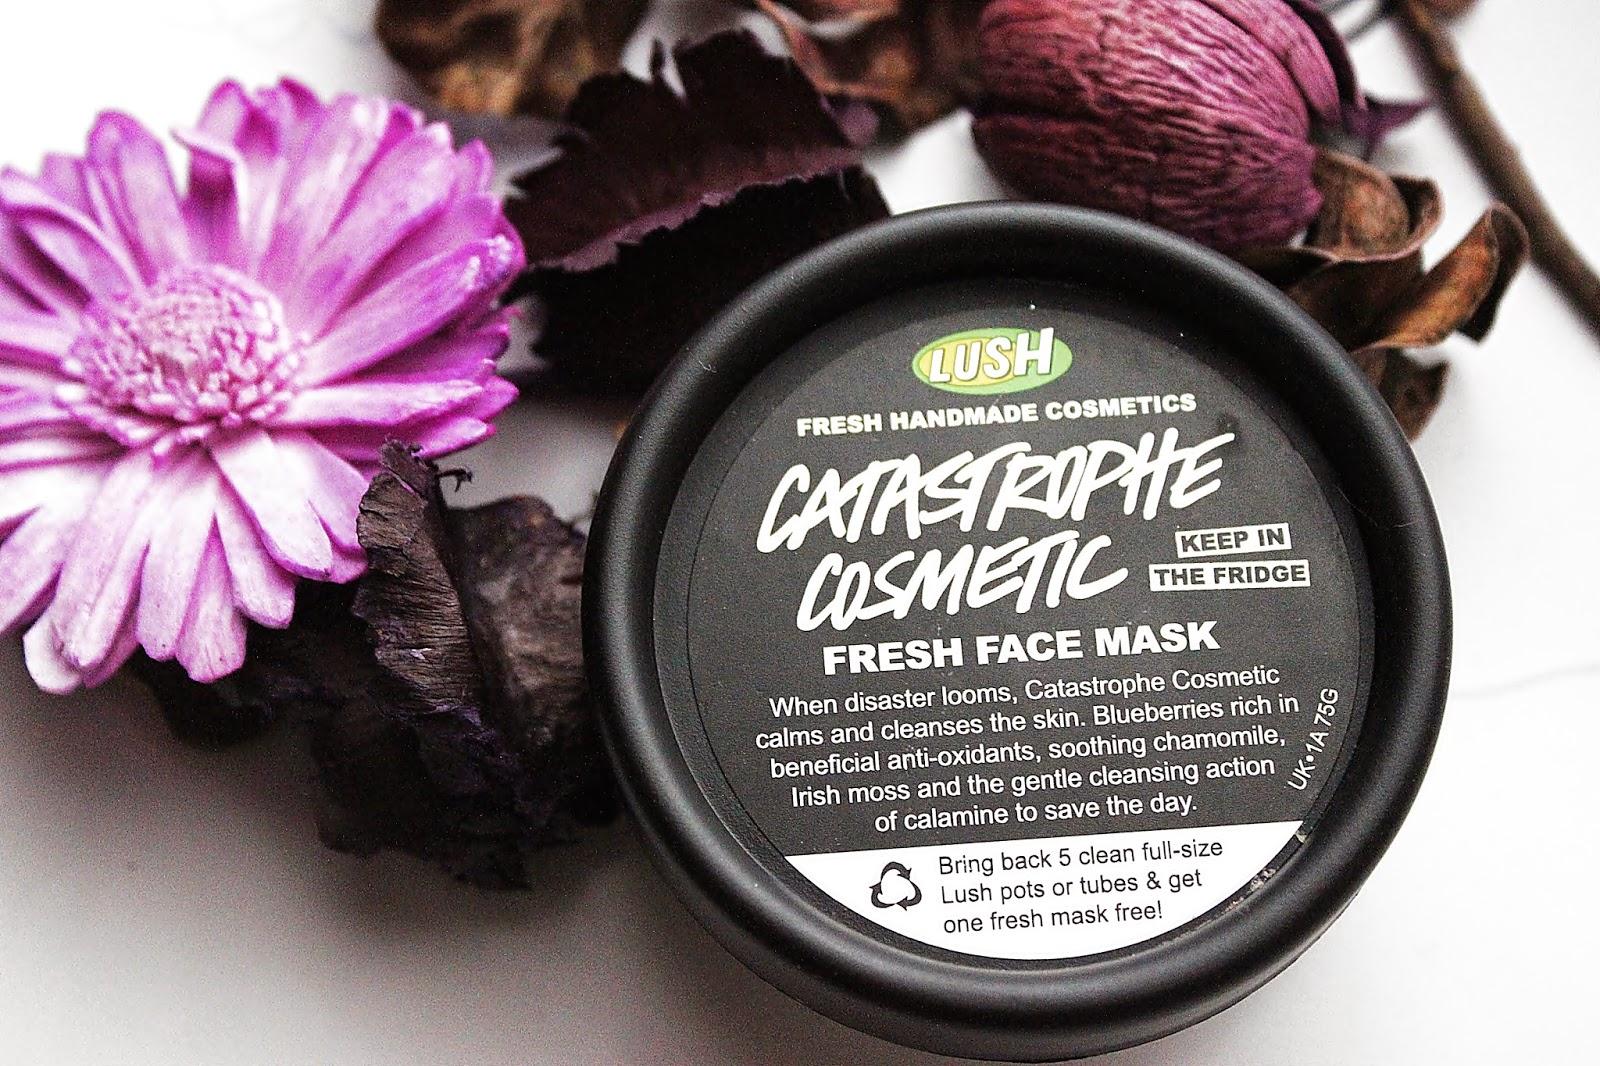 LUSH, Catastrophe Cosmetic, maseczka do twarzy, naturalna maseczka, kosmetyki naturalne